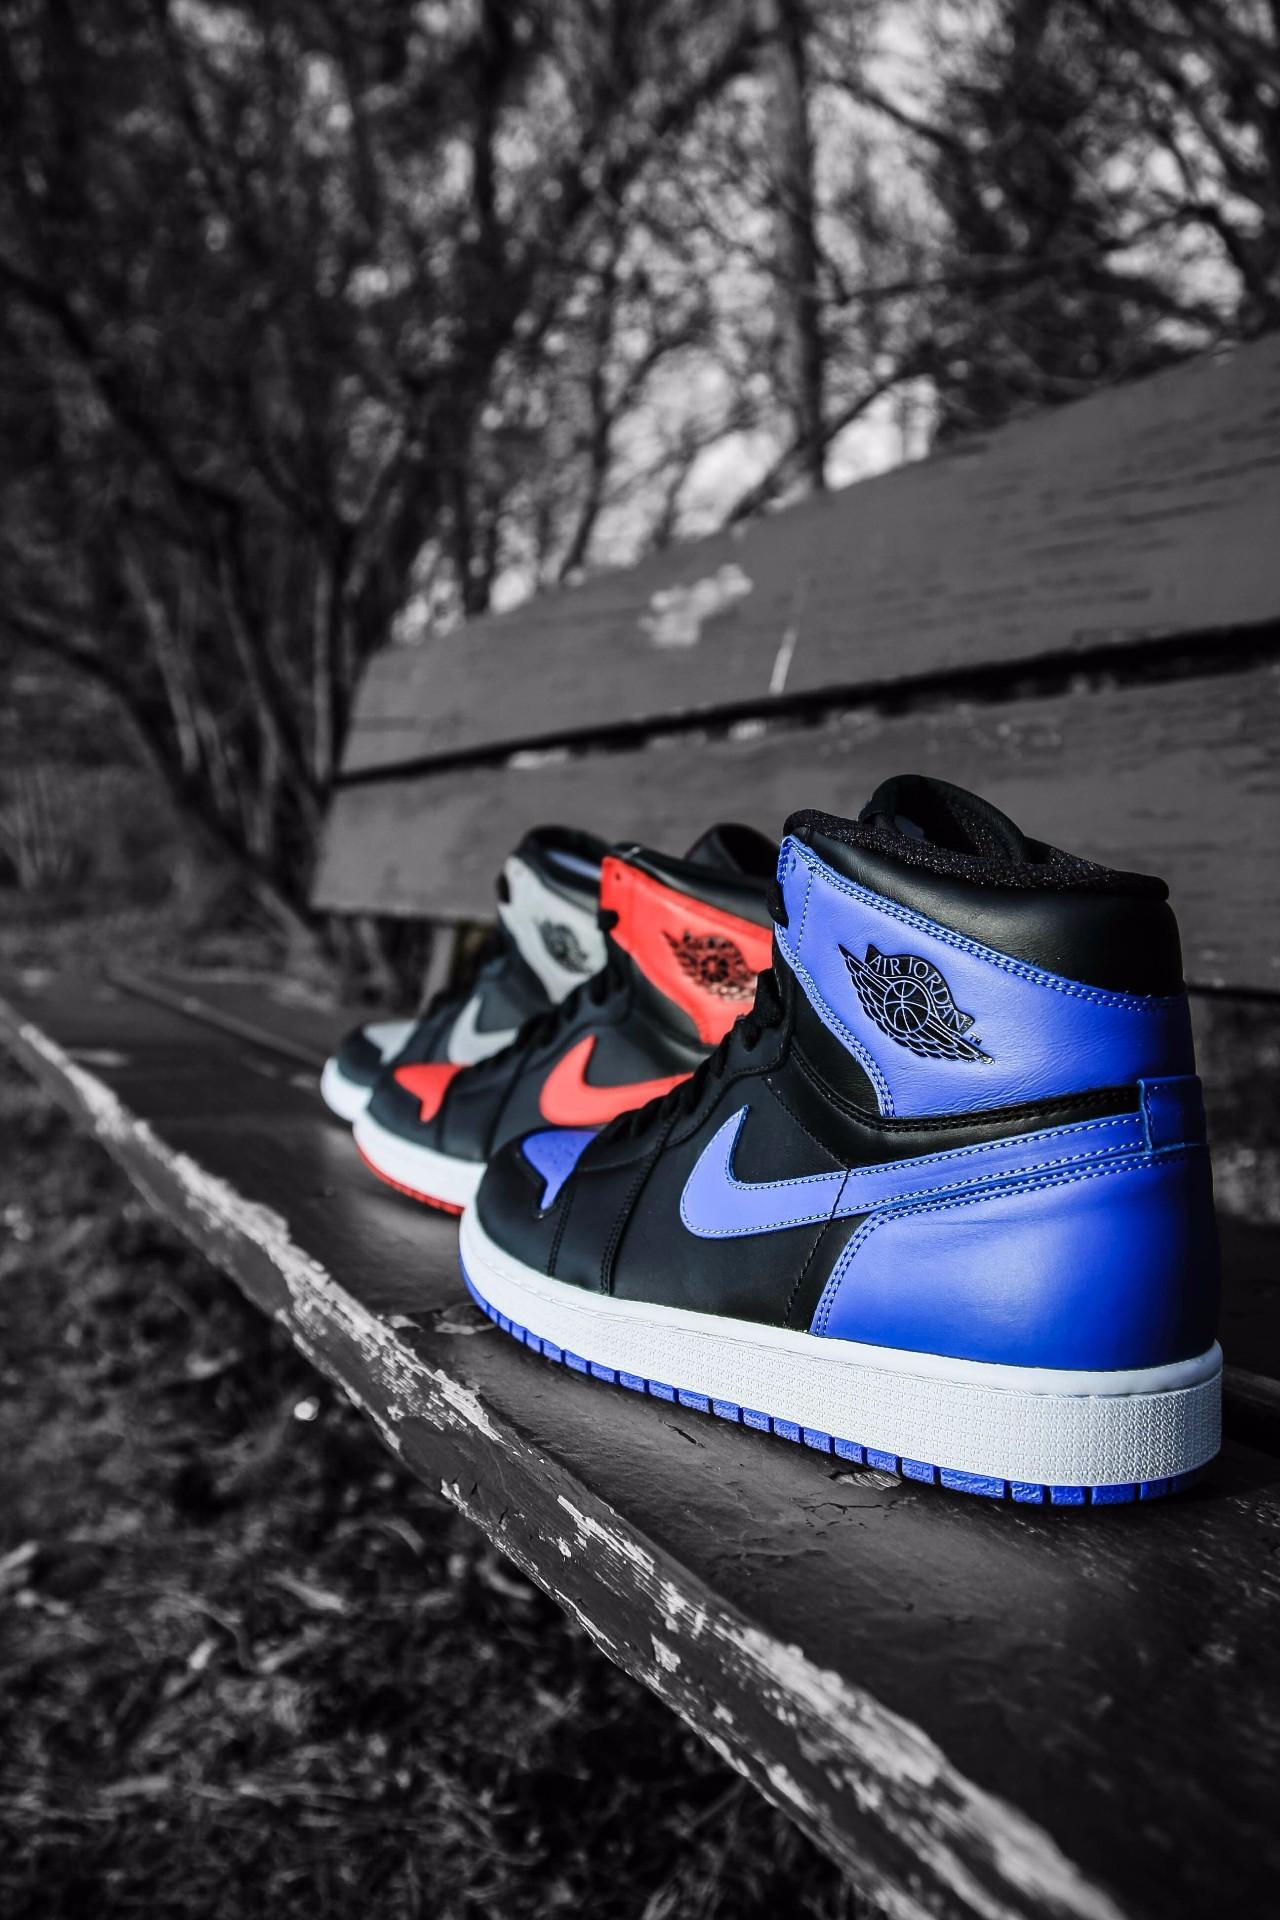 Src Air Jordan Shoes Wallpaper Htc Data